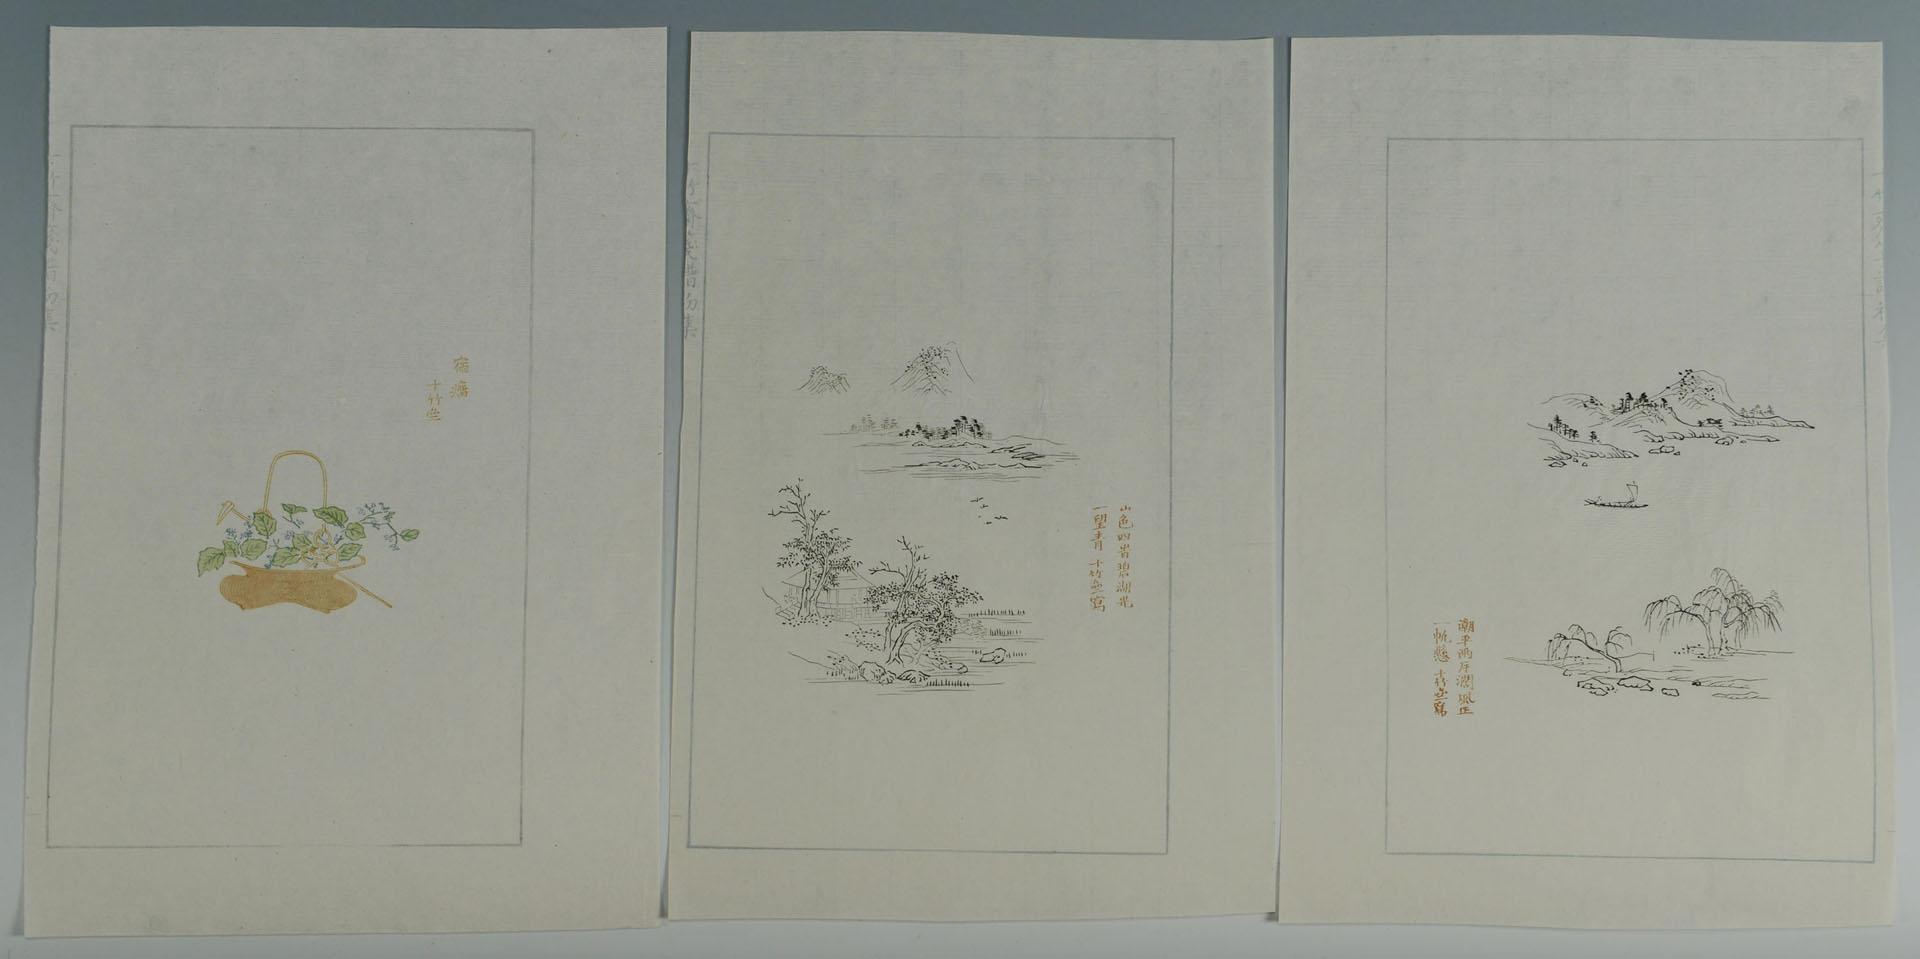 22 Woodblock Prints, Ten Bamboo Studio